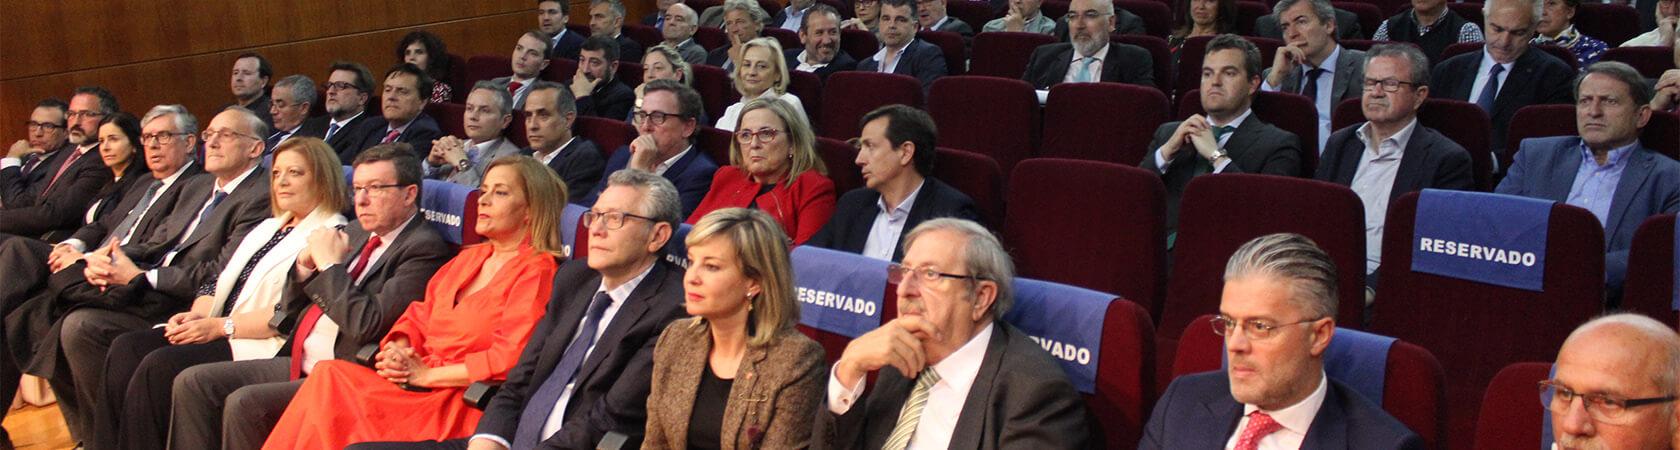 005_2019 4 29 Asamblea General CEP_2